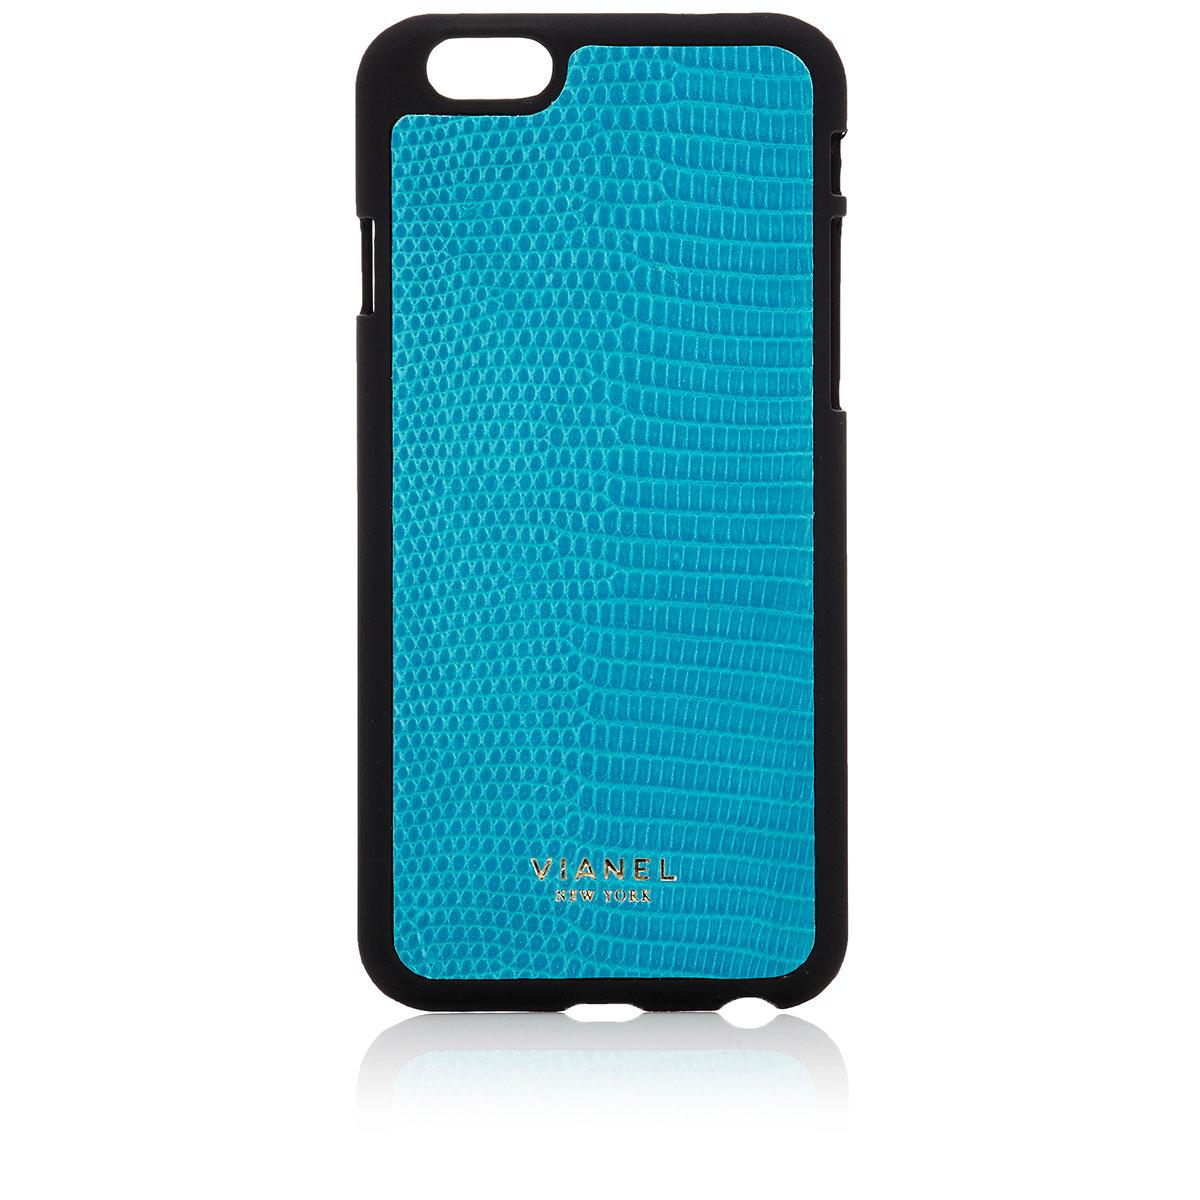 Vianel Lizard Iphone® 6 Case in Blue